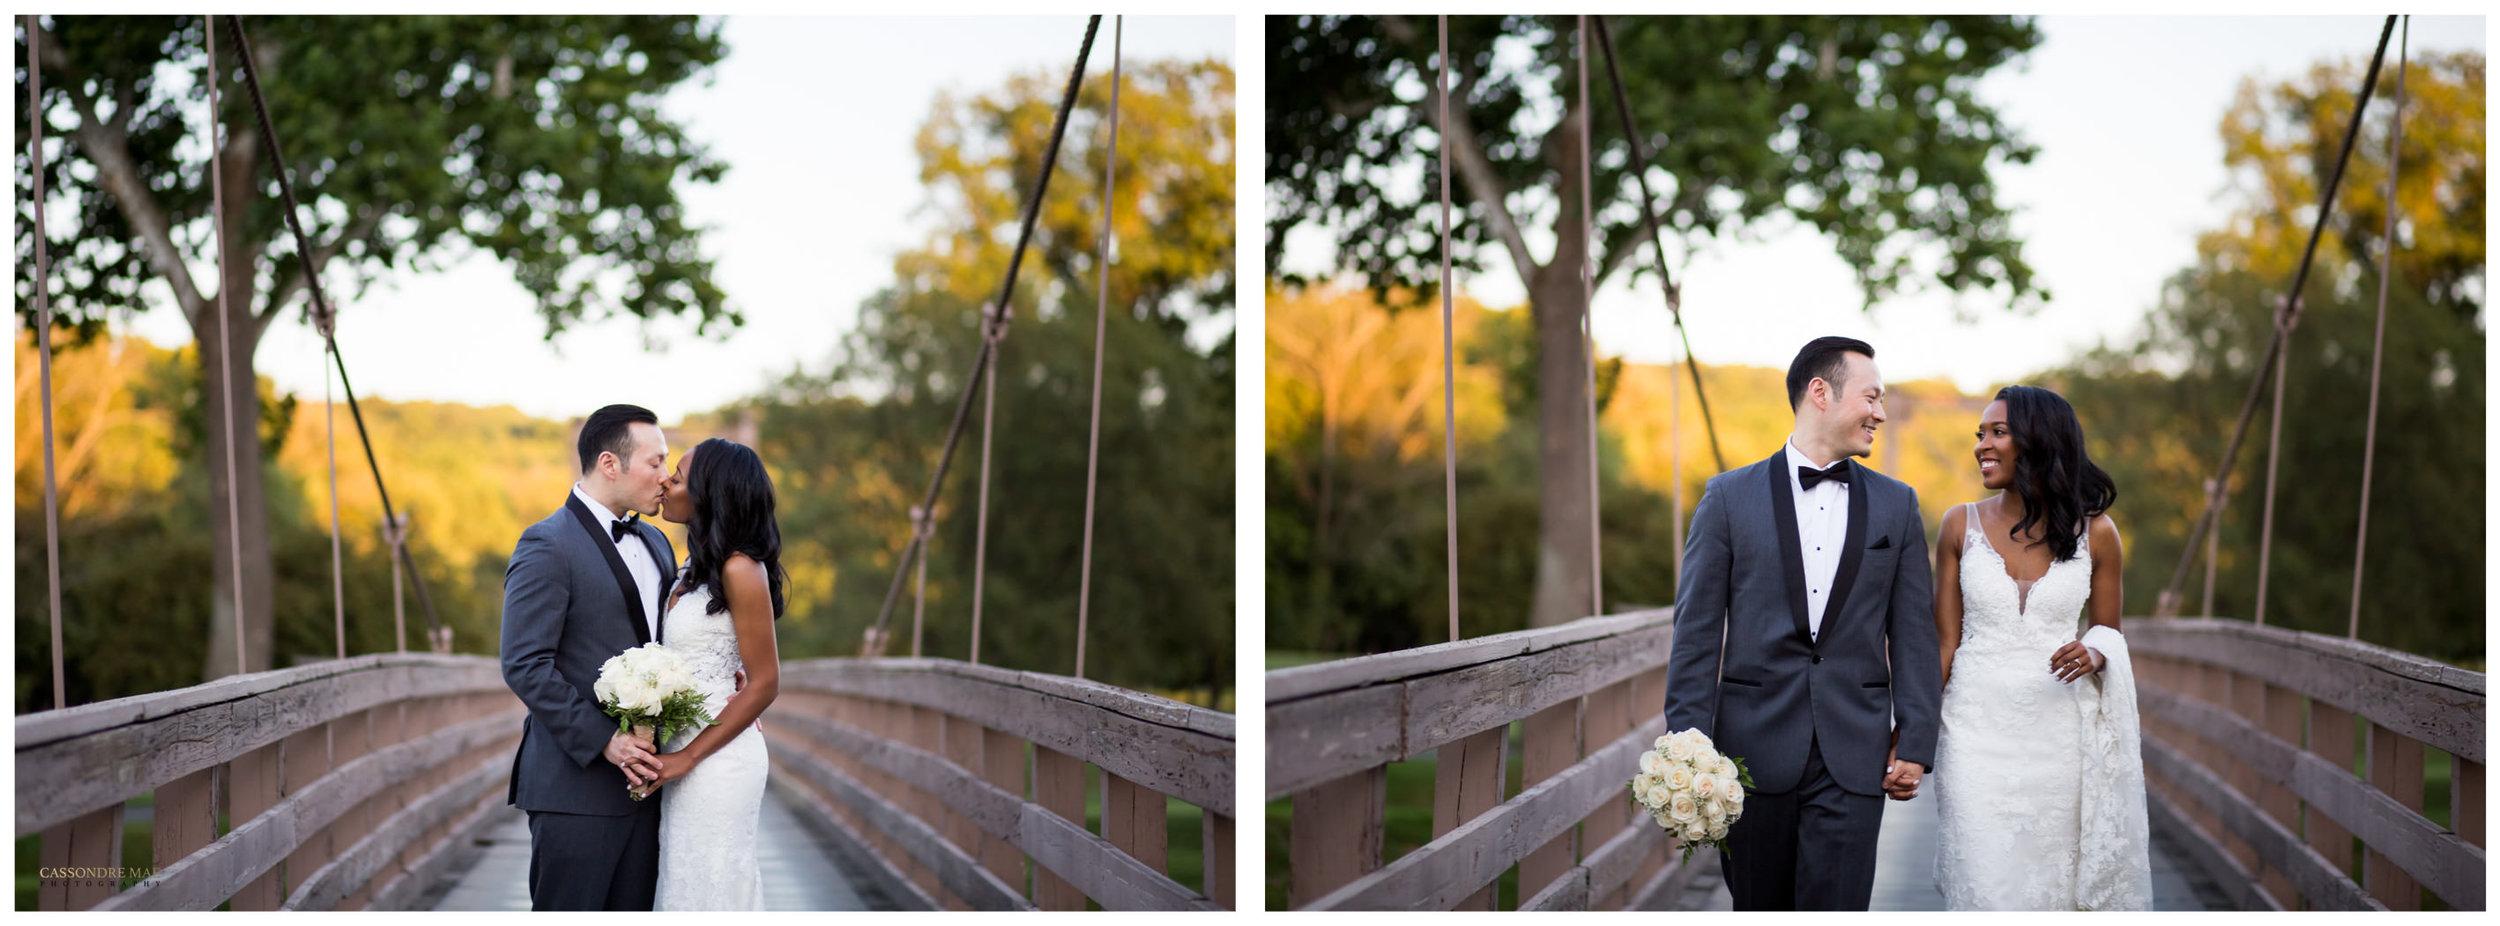 West Hills Country Club Wedding Photos Cassondre Mae Photography 13.jpg